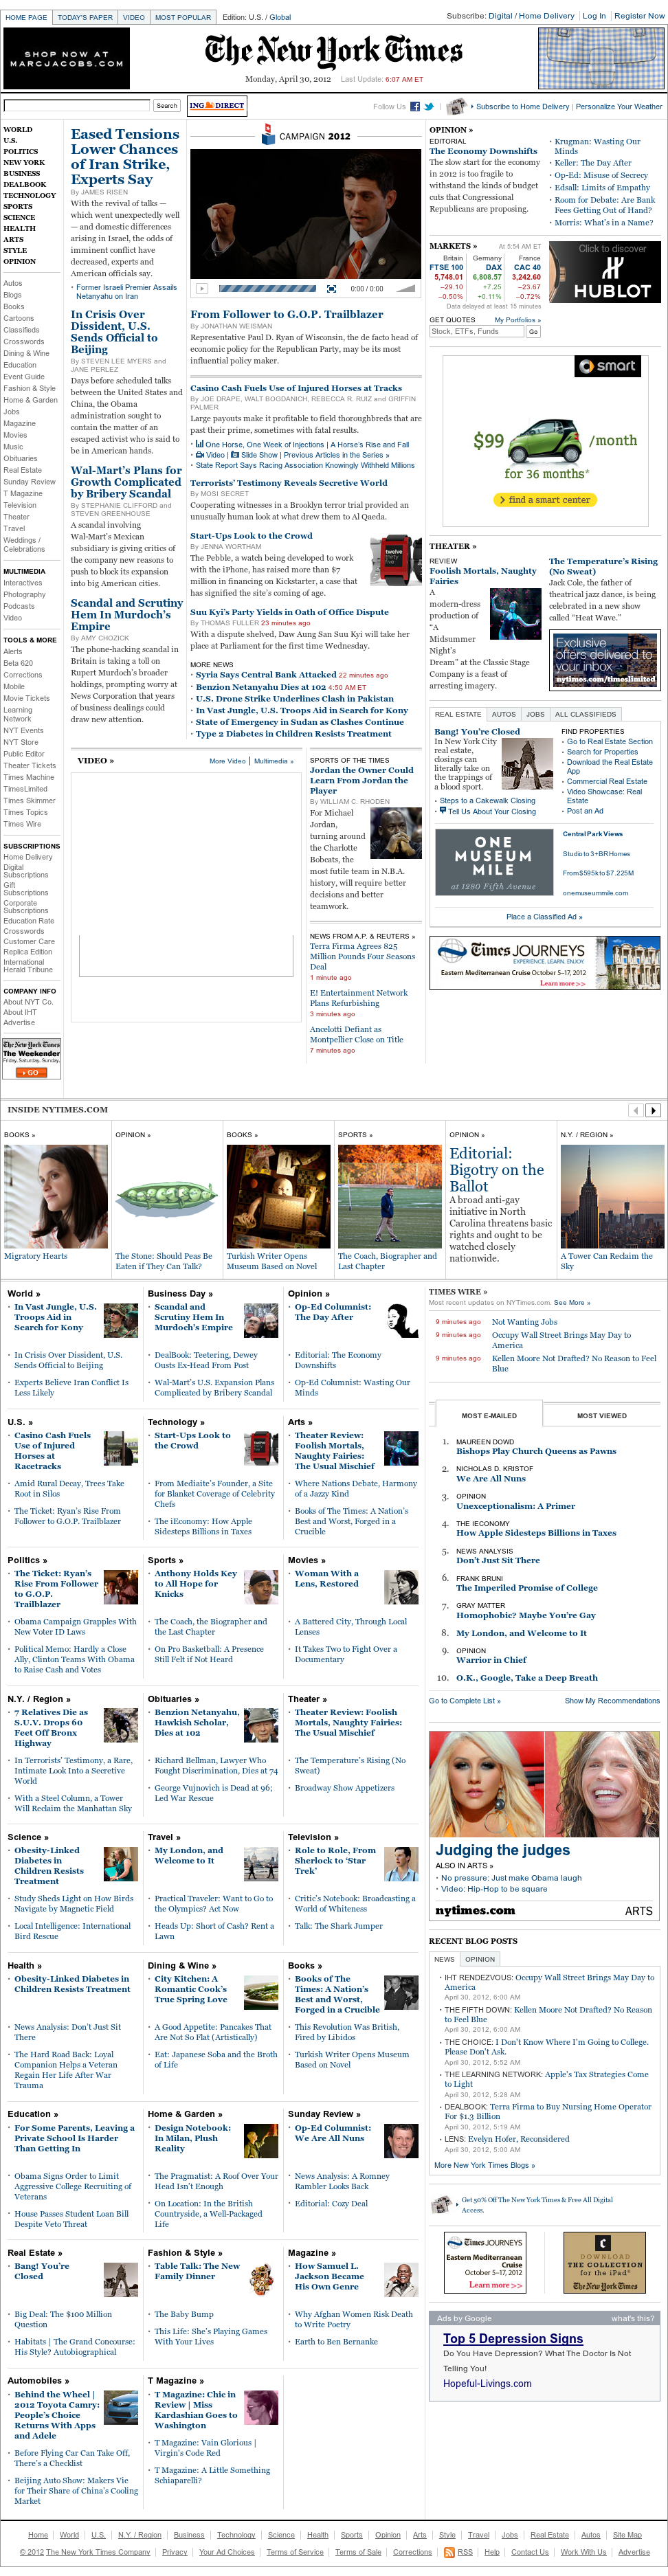 The New York Times at Monday April 30, 2012, 10:09 a.m. UTC